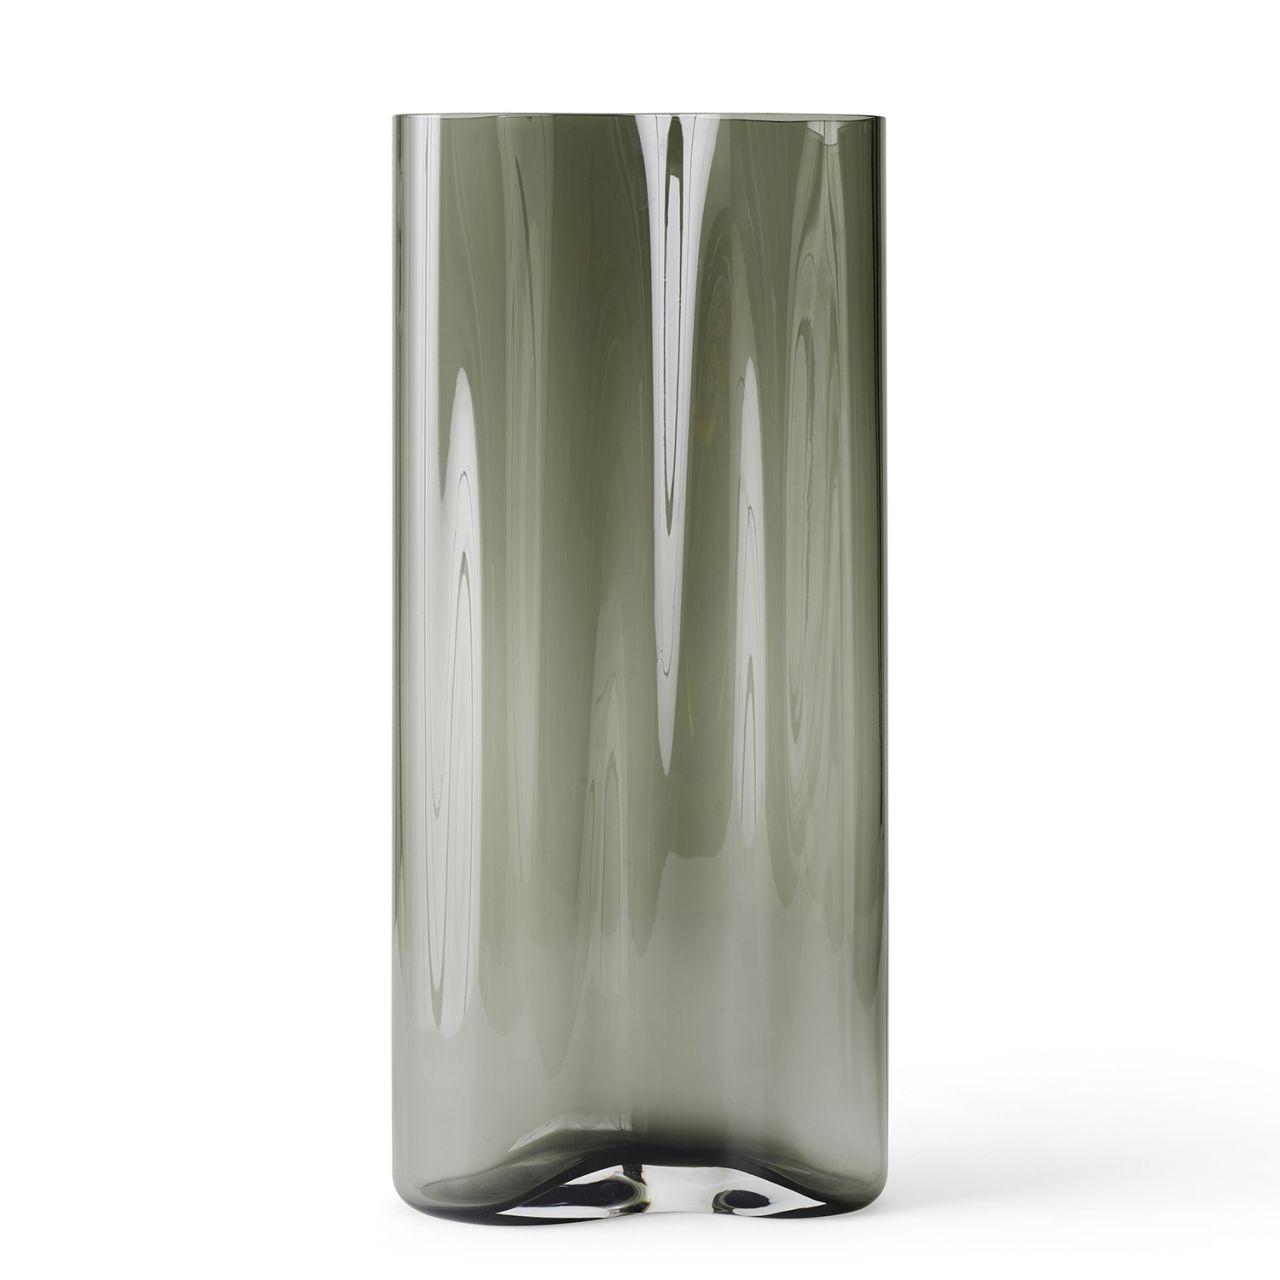 menu - Aer Vase 4737949